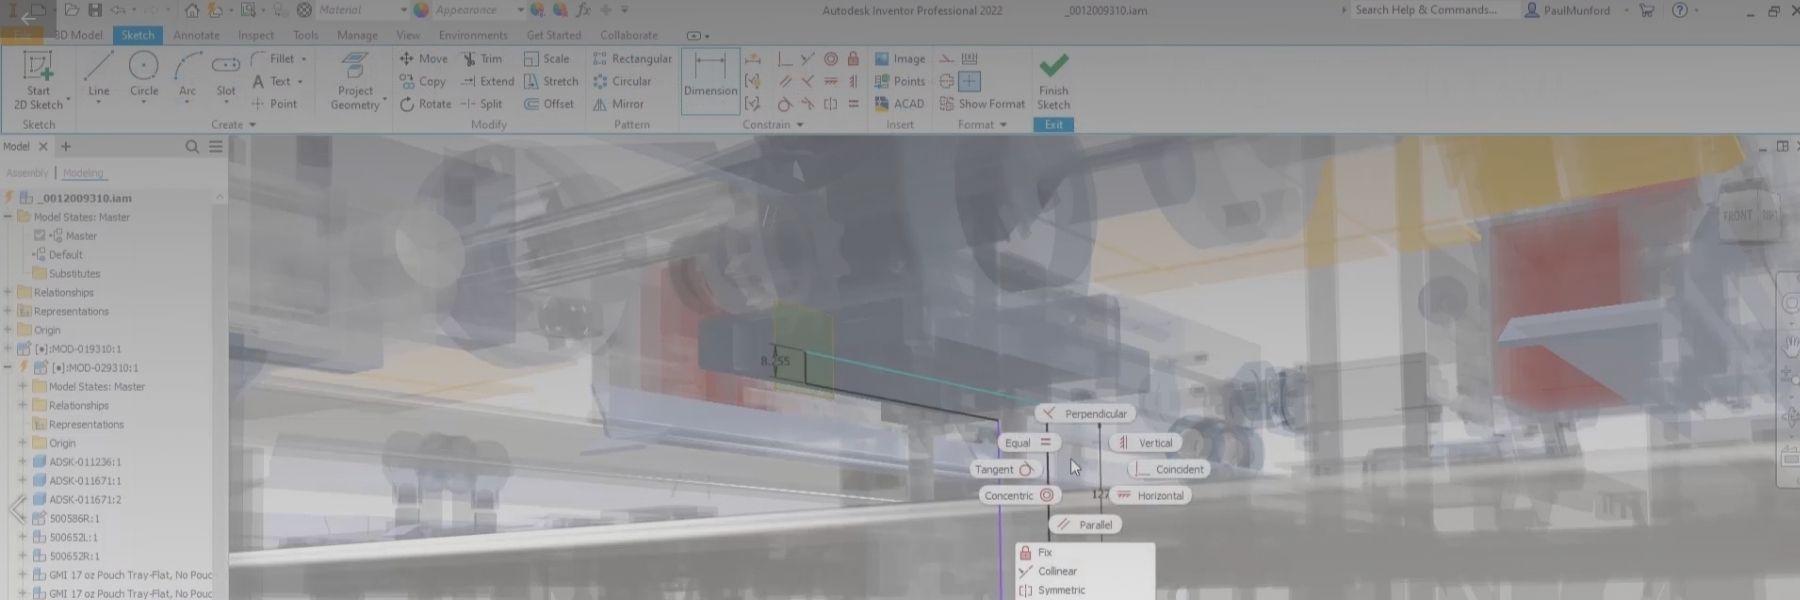 Autodesk Inventor 2022 Novità